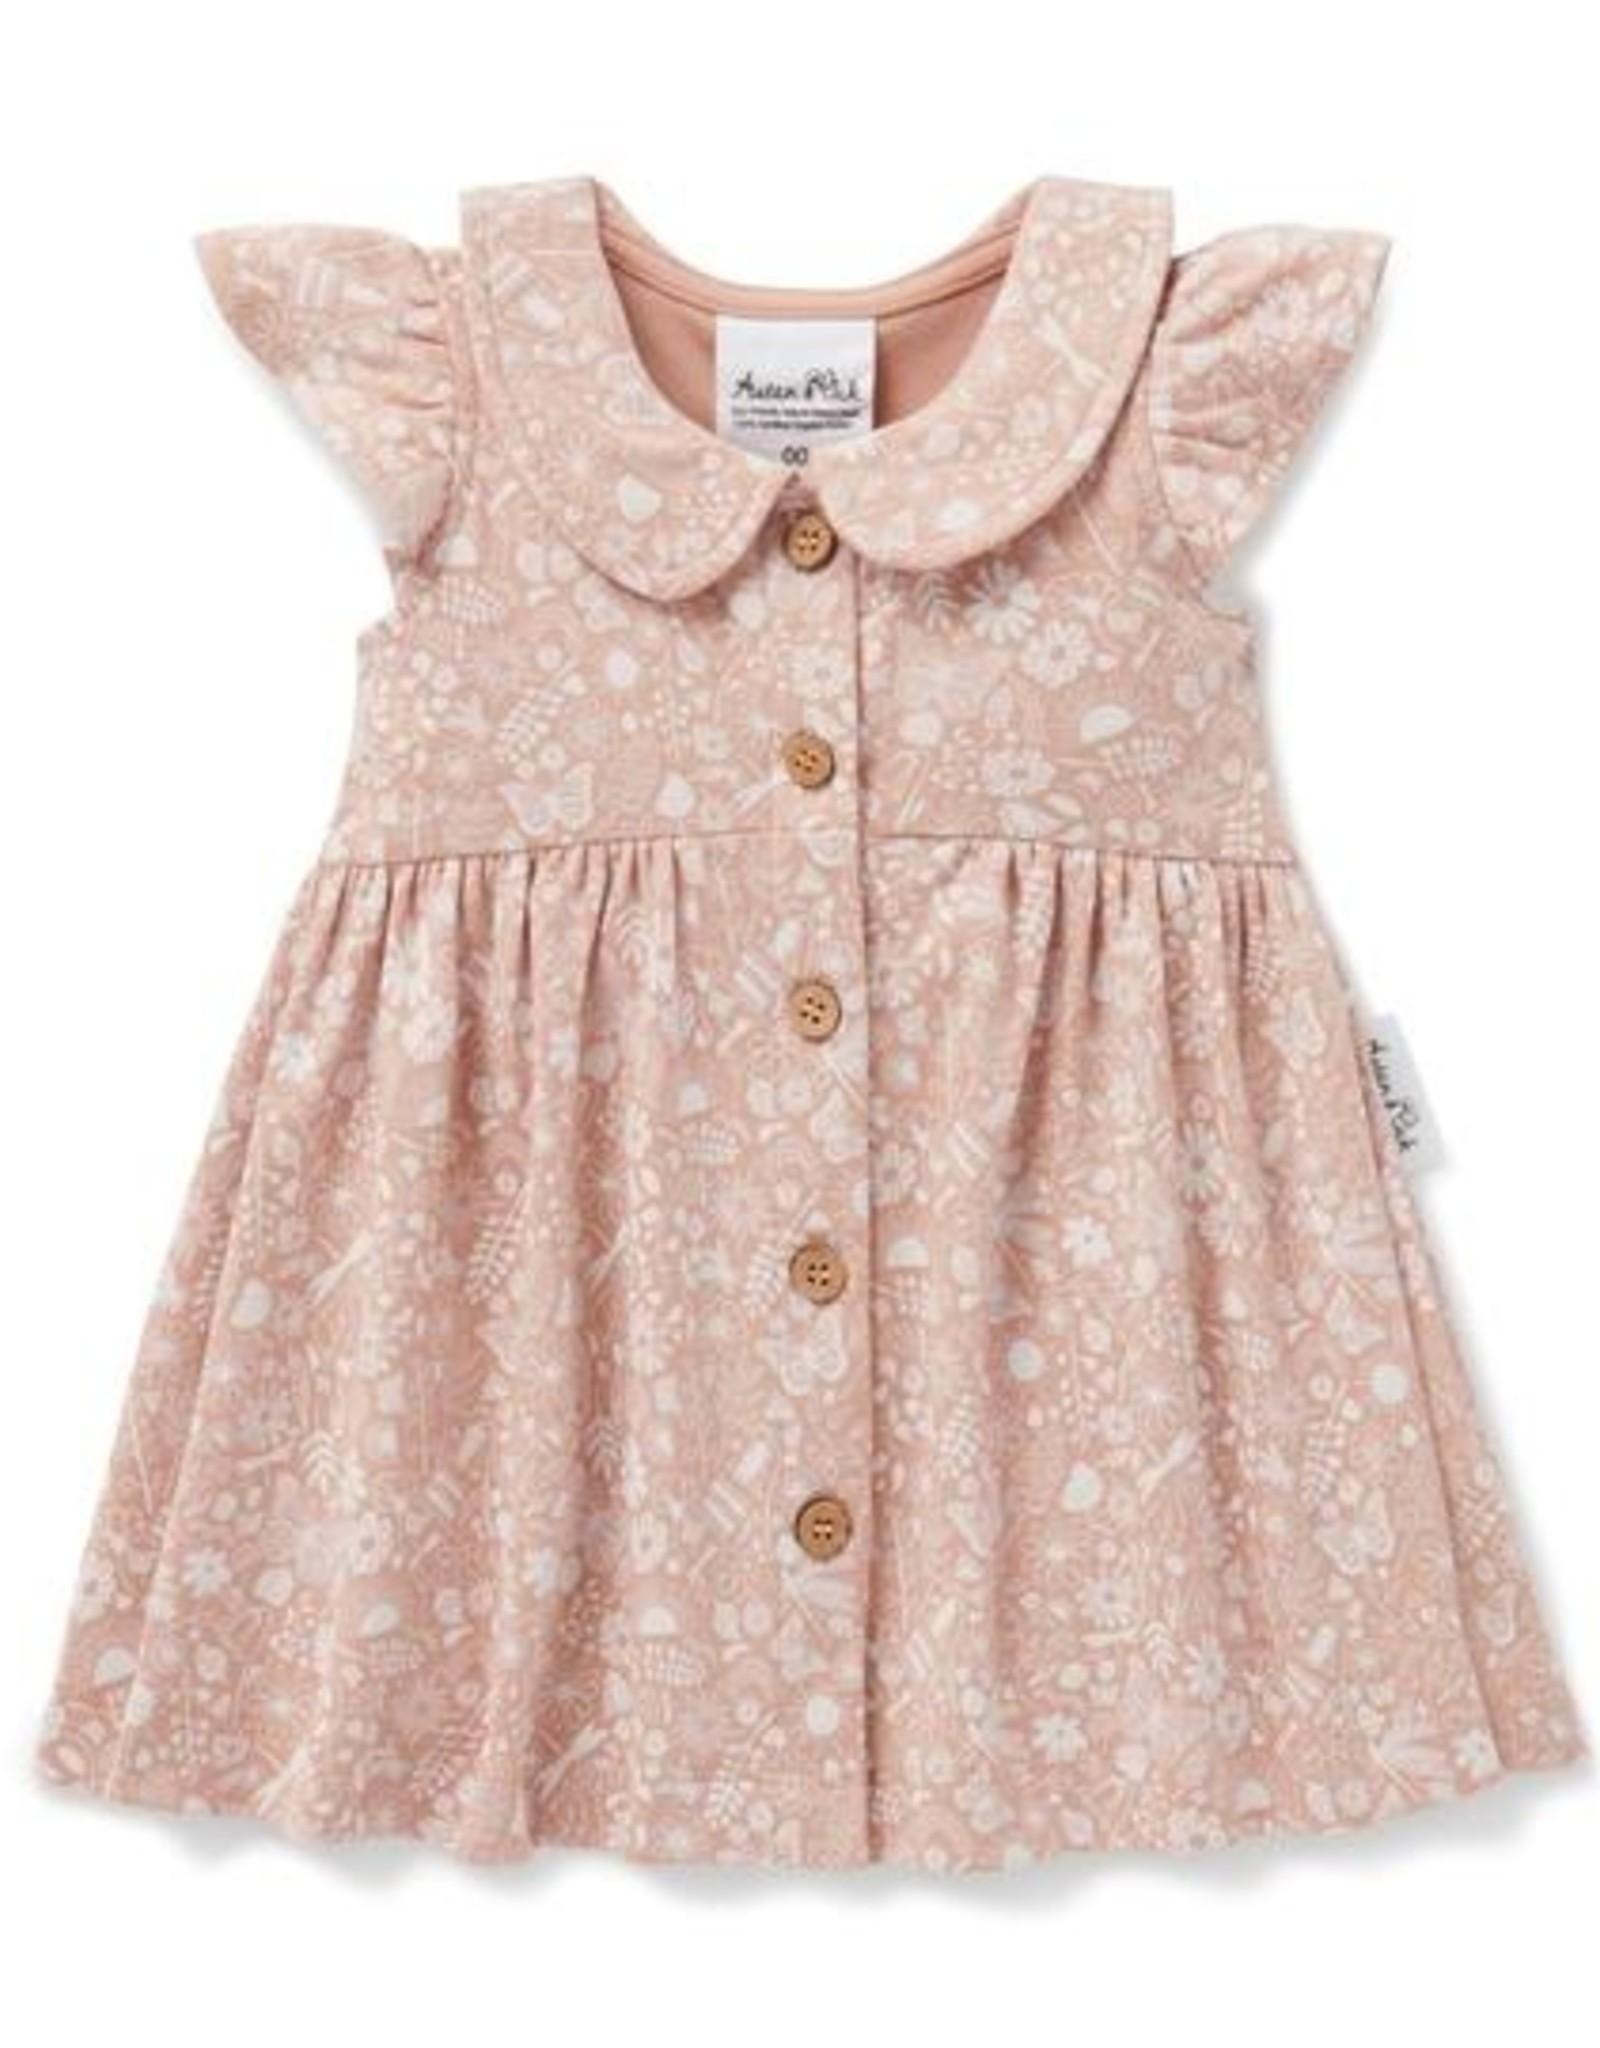 Aster & Oak Aster & Oak - Ditzy Floral Button  Dress